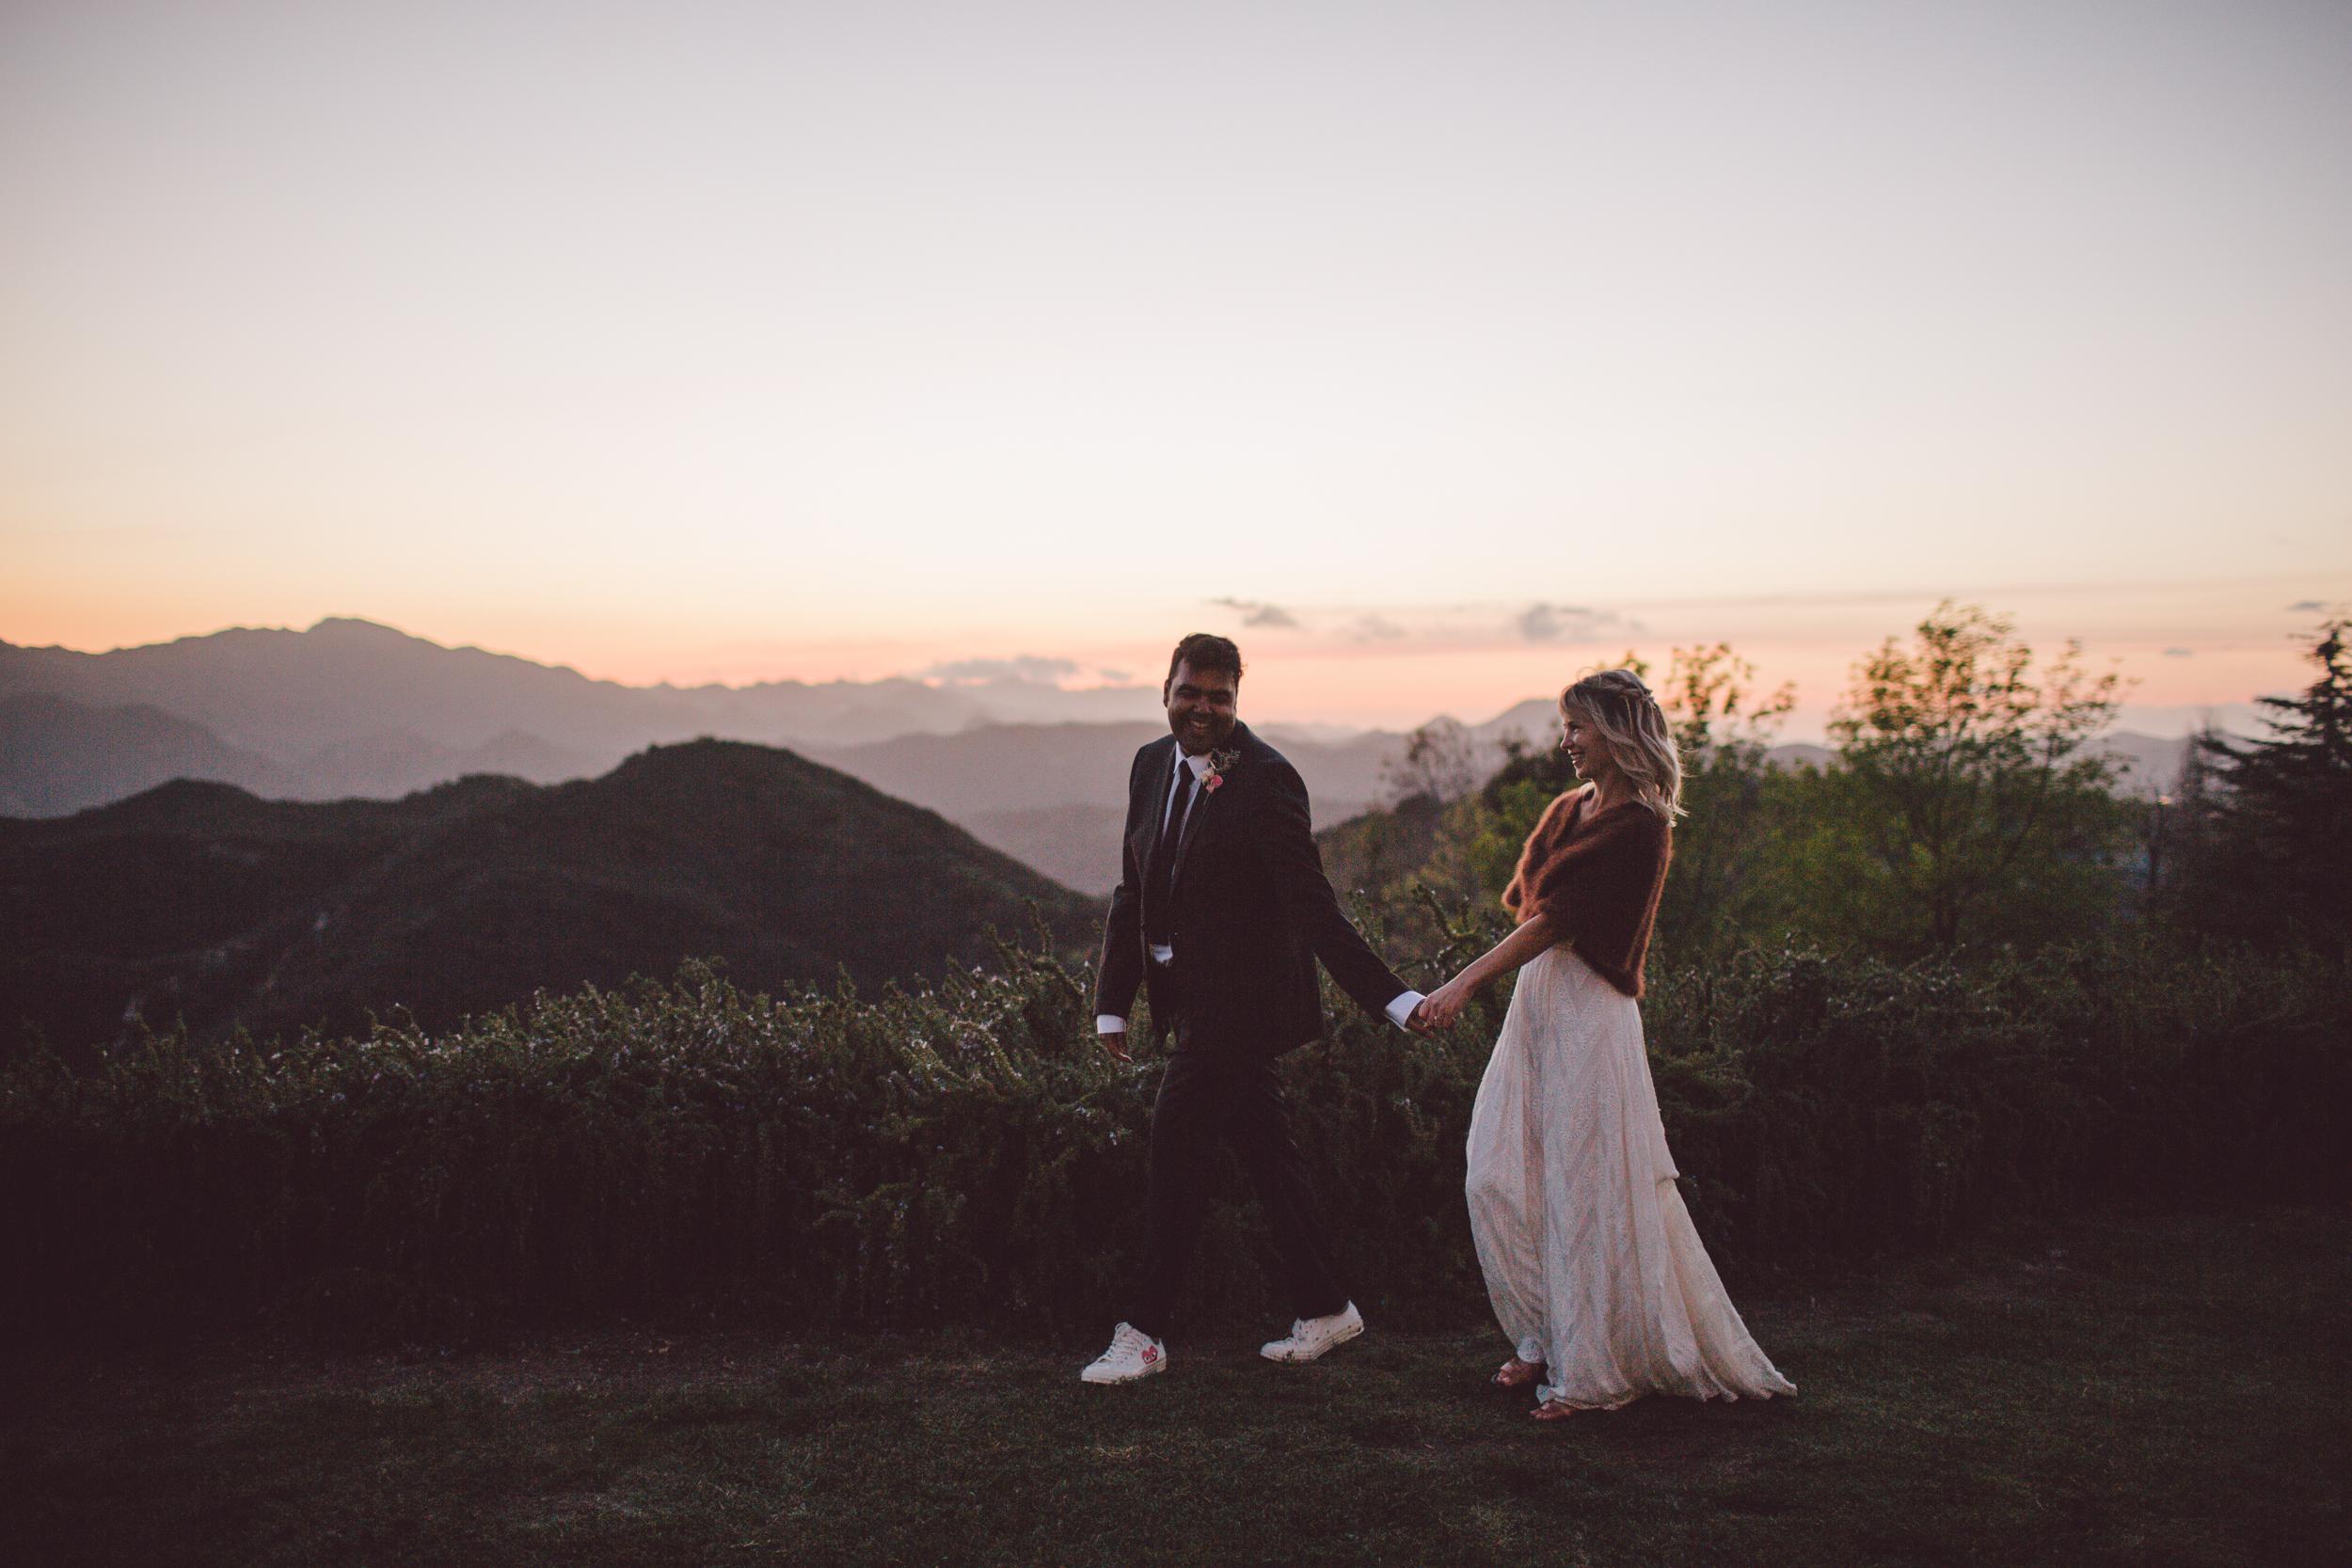 romantic-wedding-malibu-sunset-couple